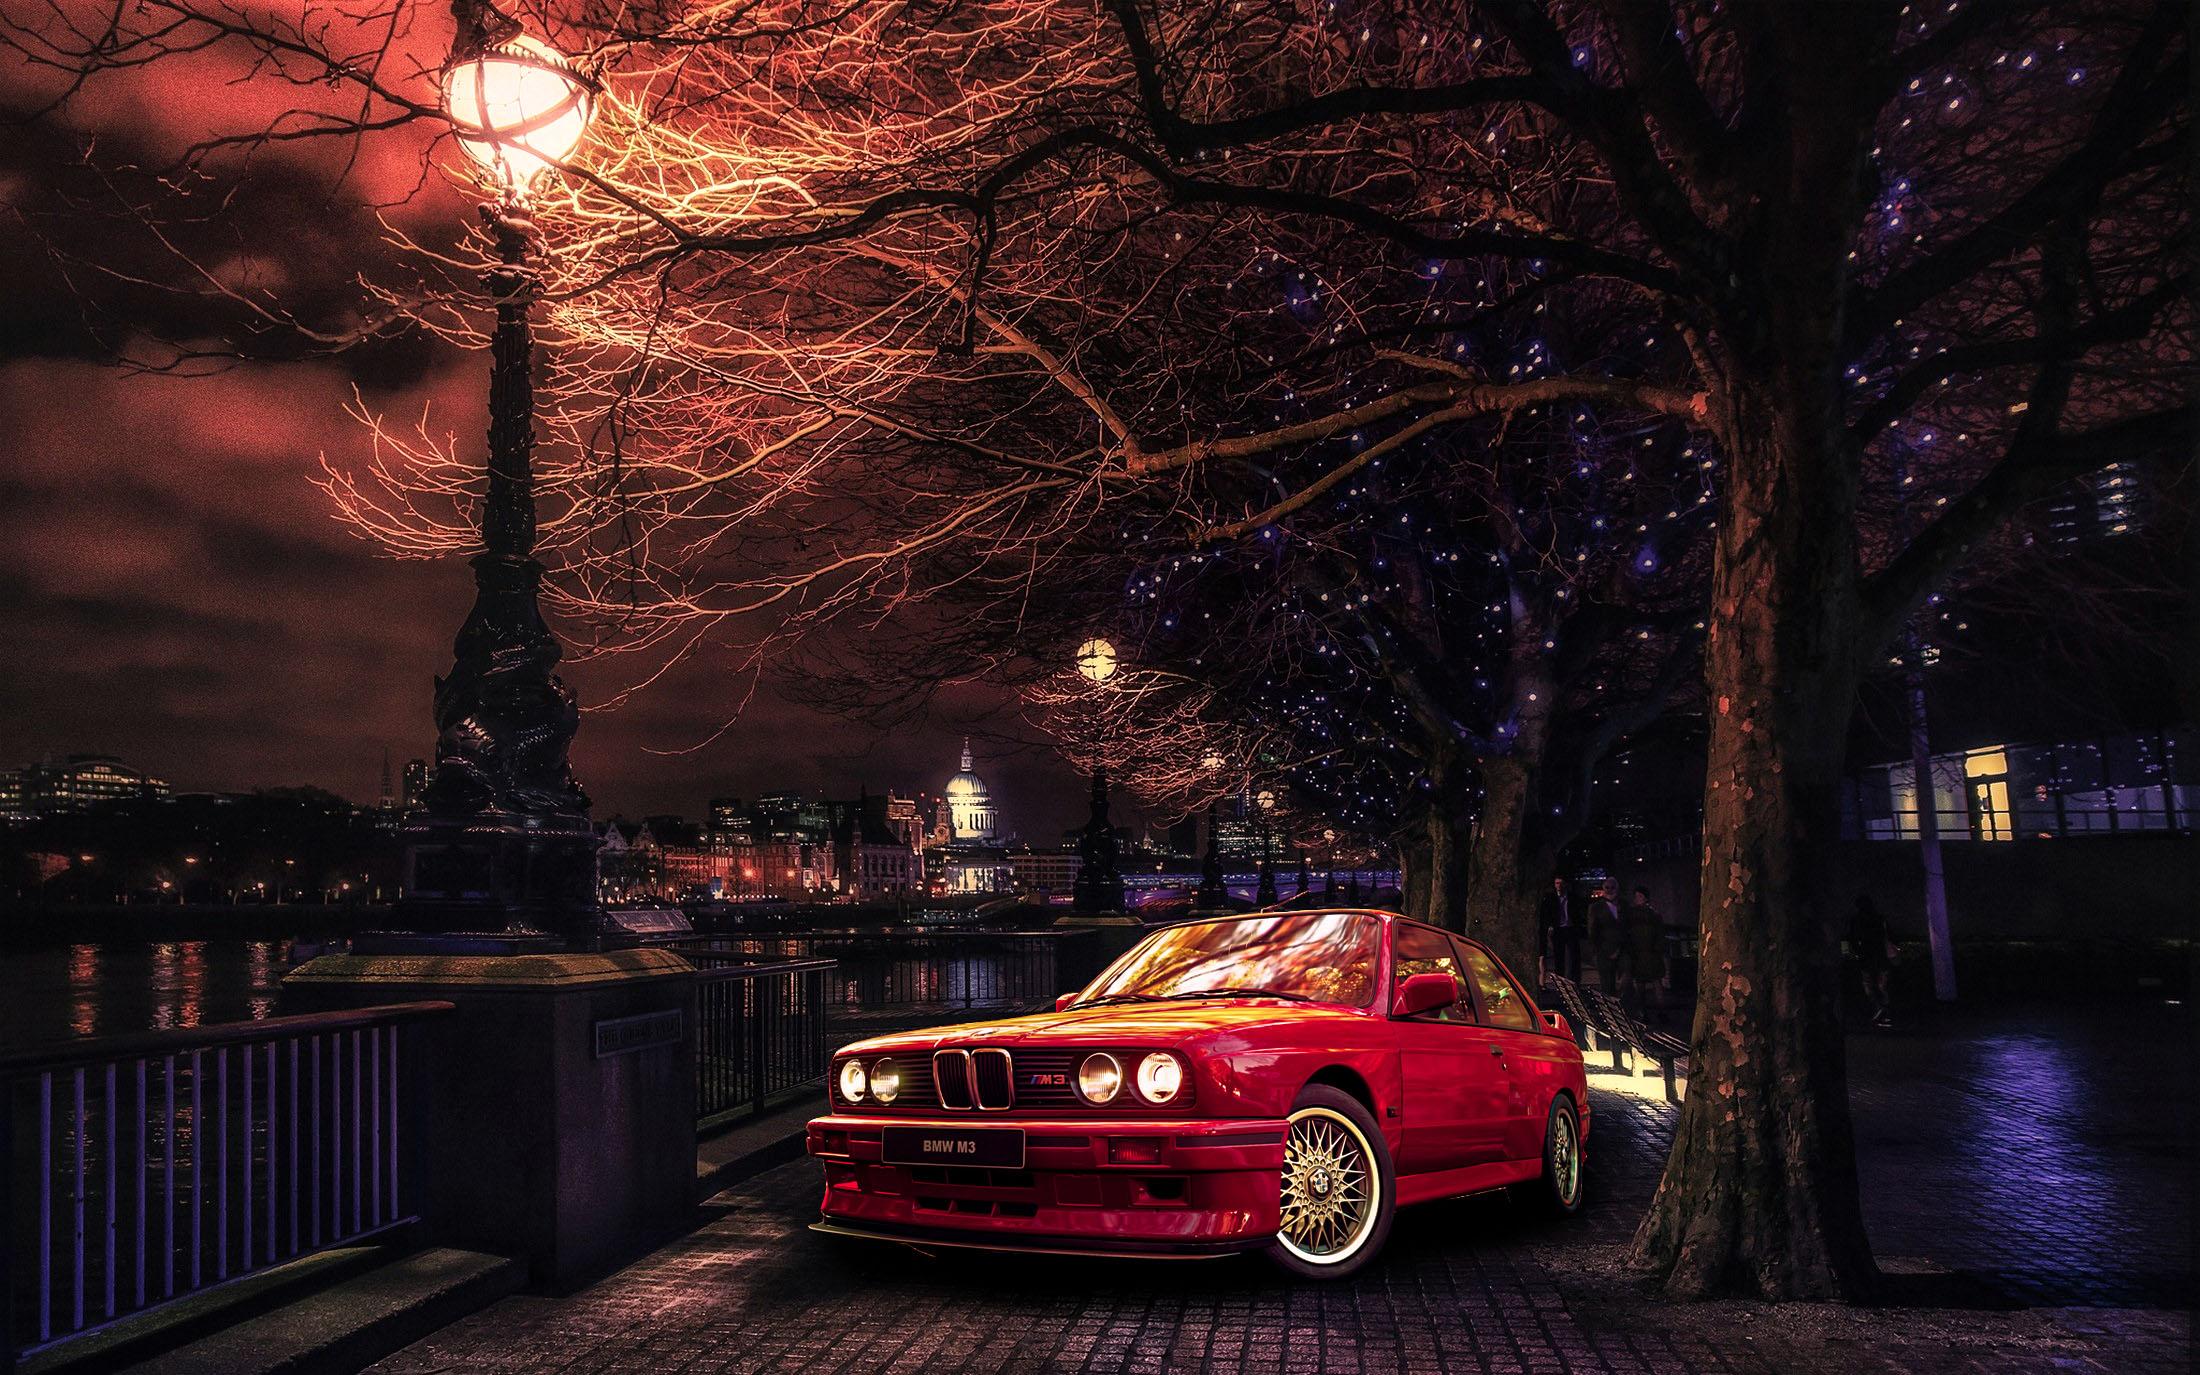 Bmw London Car Red Cars Trees Artwork Vehicle Bmw E30 Bmw 3 Series Wallpaper Resolution 2200x1375 Id 389264 Wallha Com